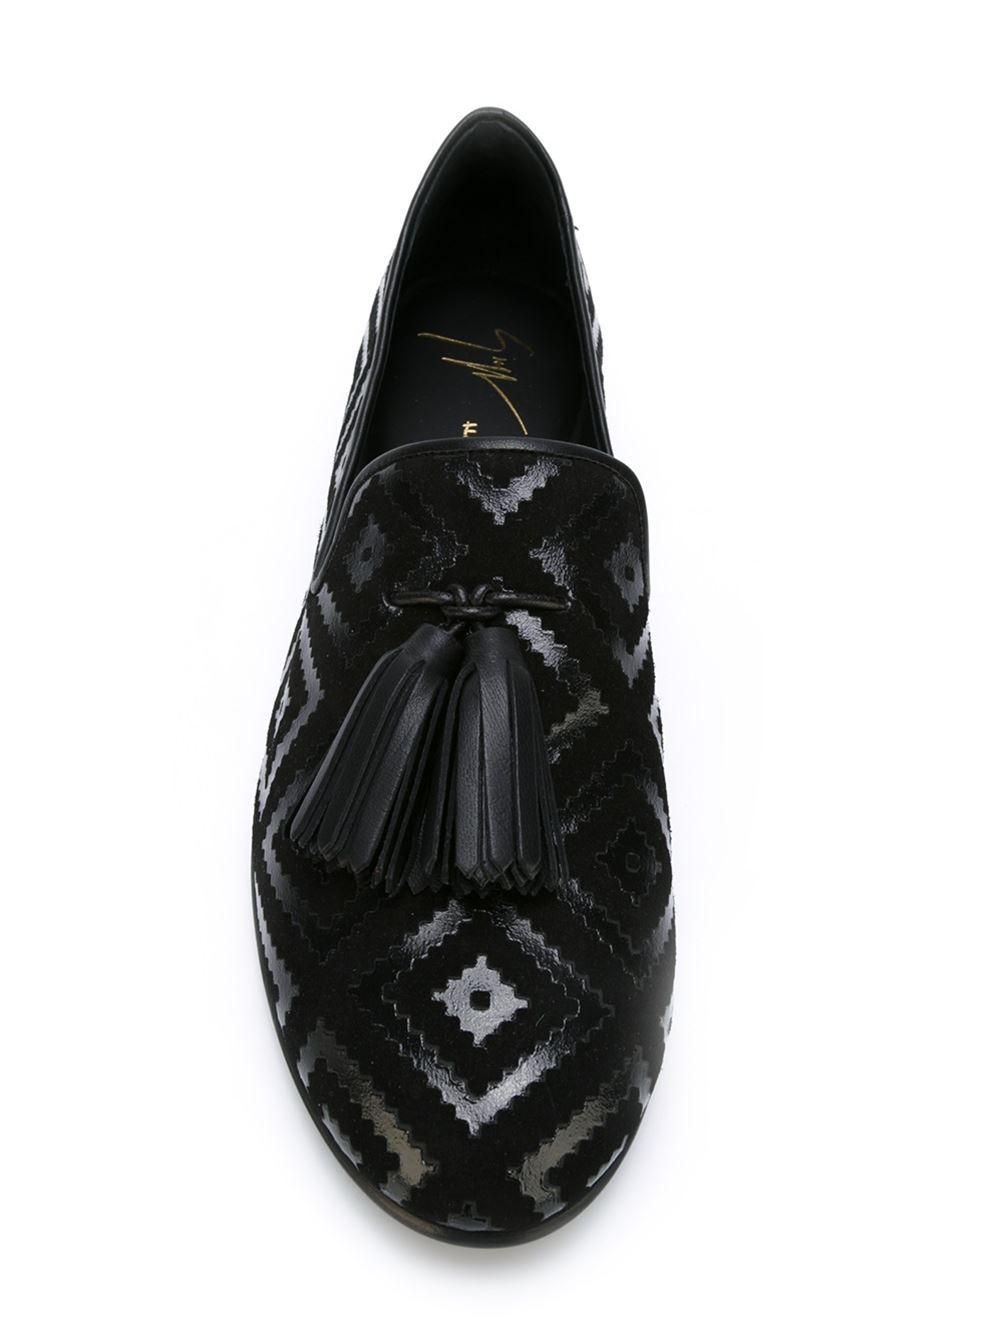 00c7989694633 Giuseppe Zanotti Design  David  loafers Chaussure Classe, Chaussures De  Luxe, Conception De